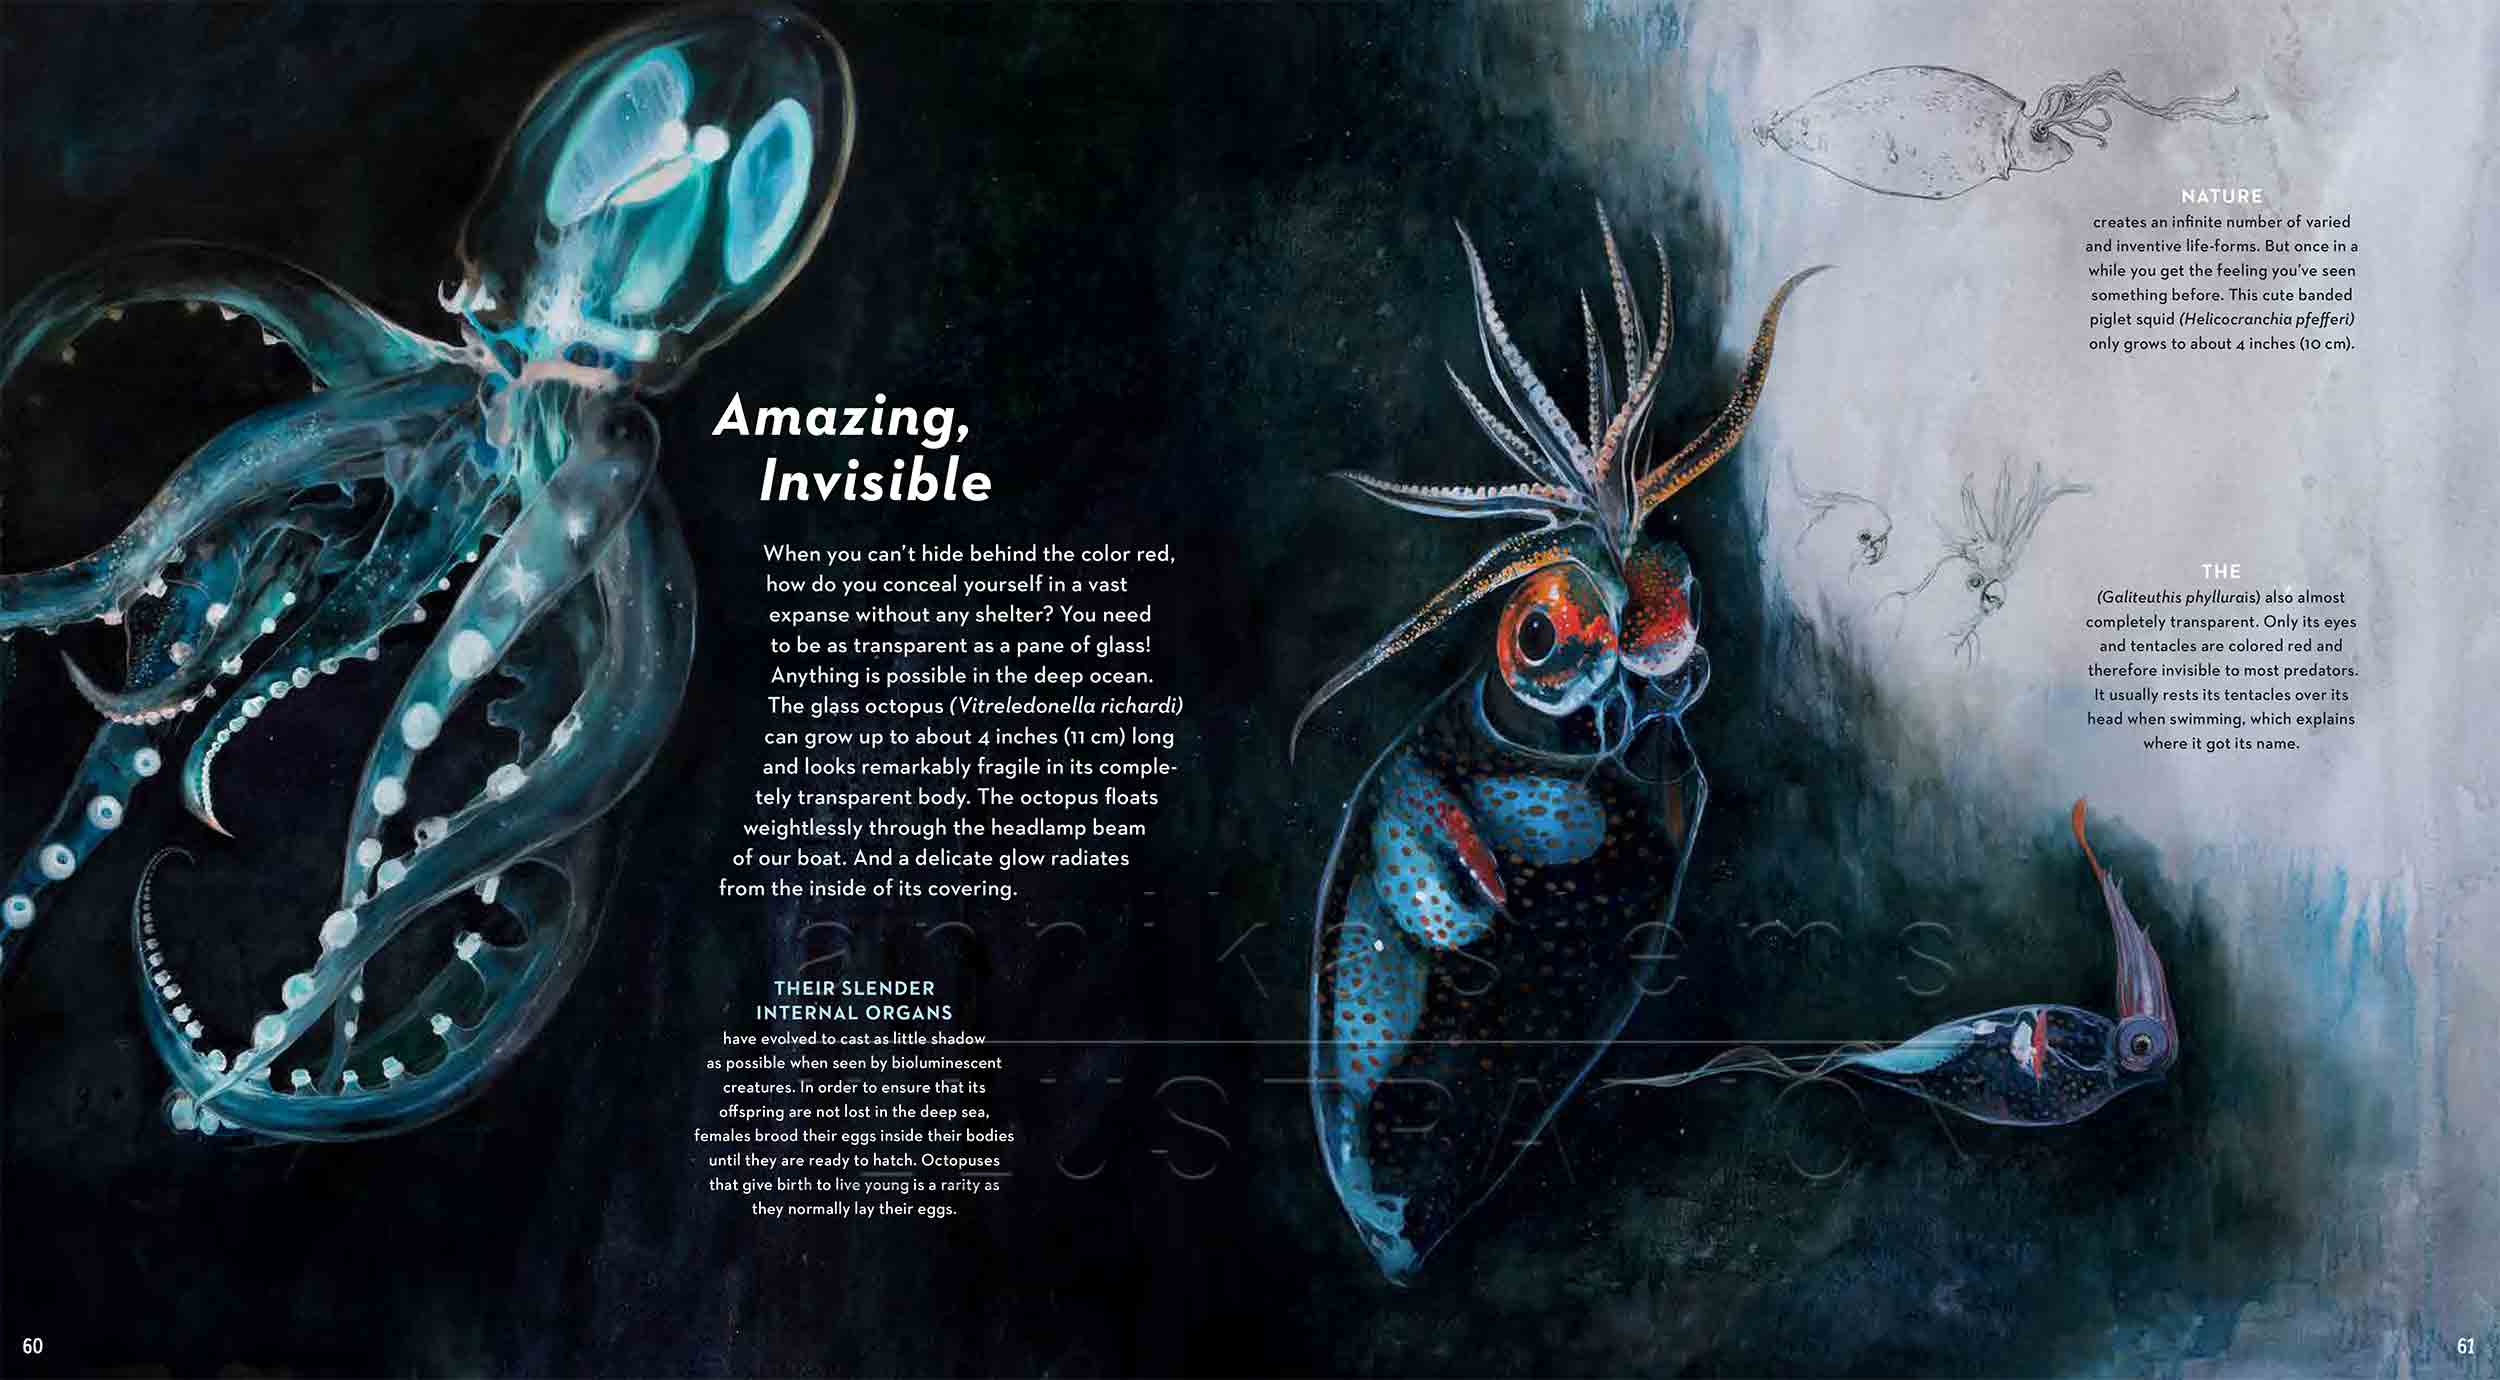 60-61-glasoctopus-cockatoo-squid-deep-sea-Englisch-submersible-©annikasiems-plankton_deepsea-zooplankton.jpg